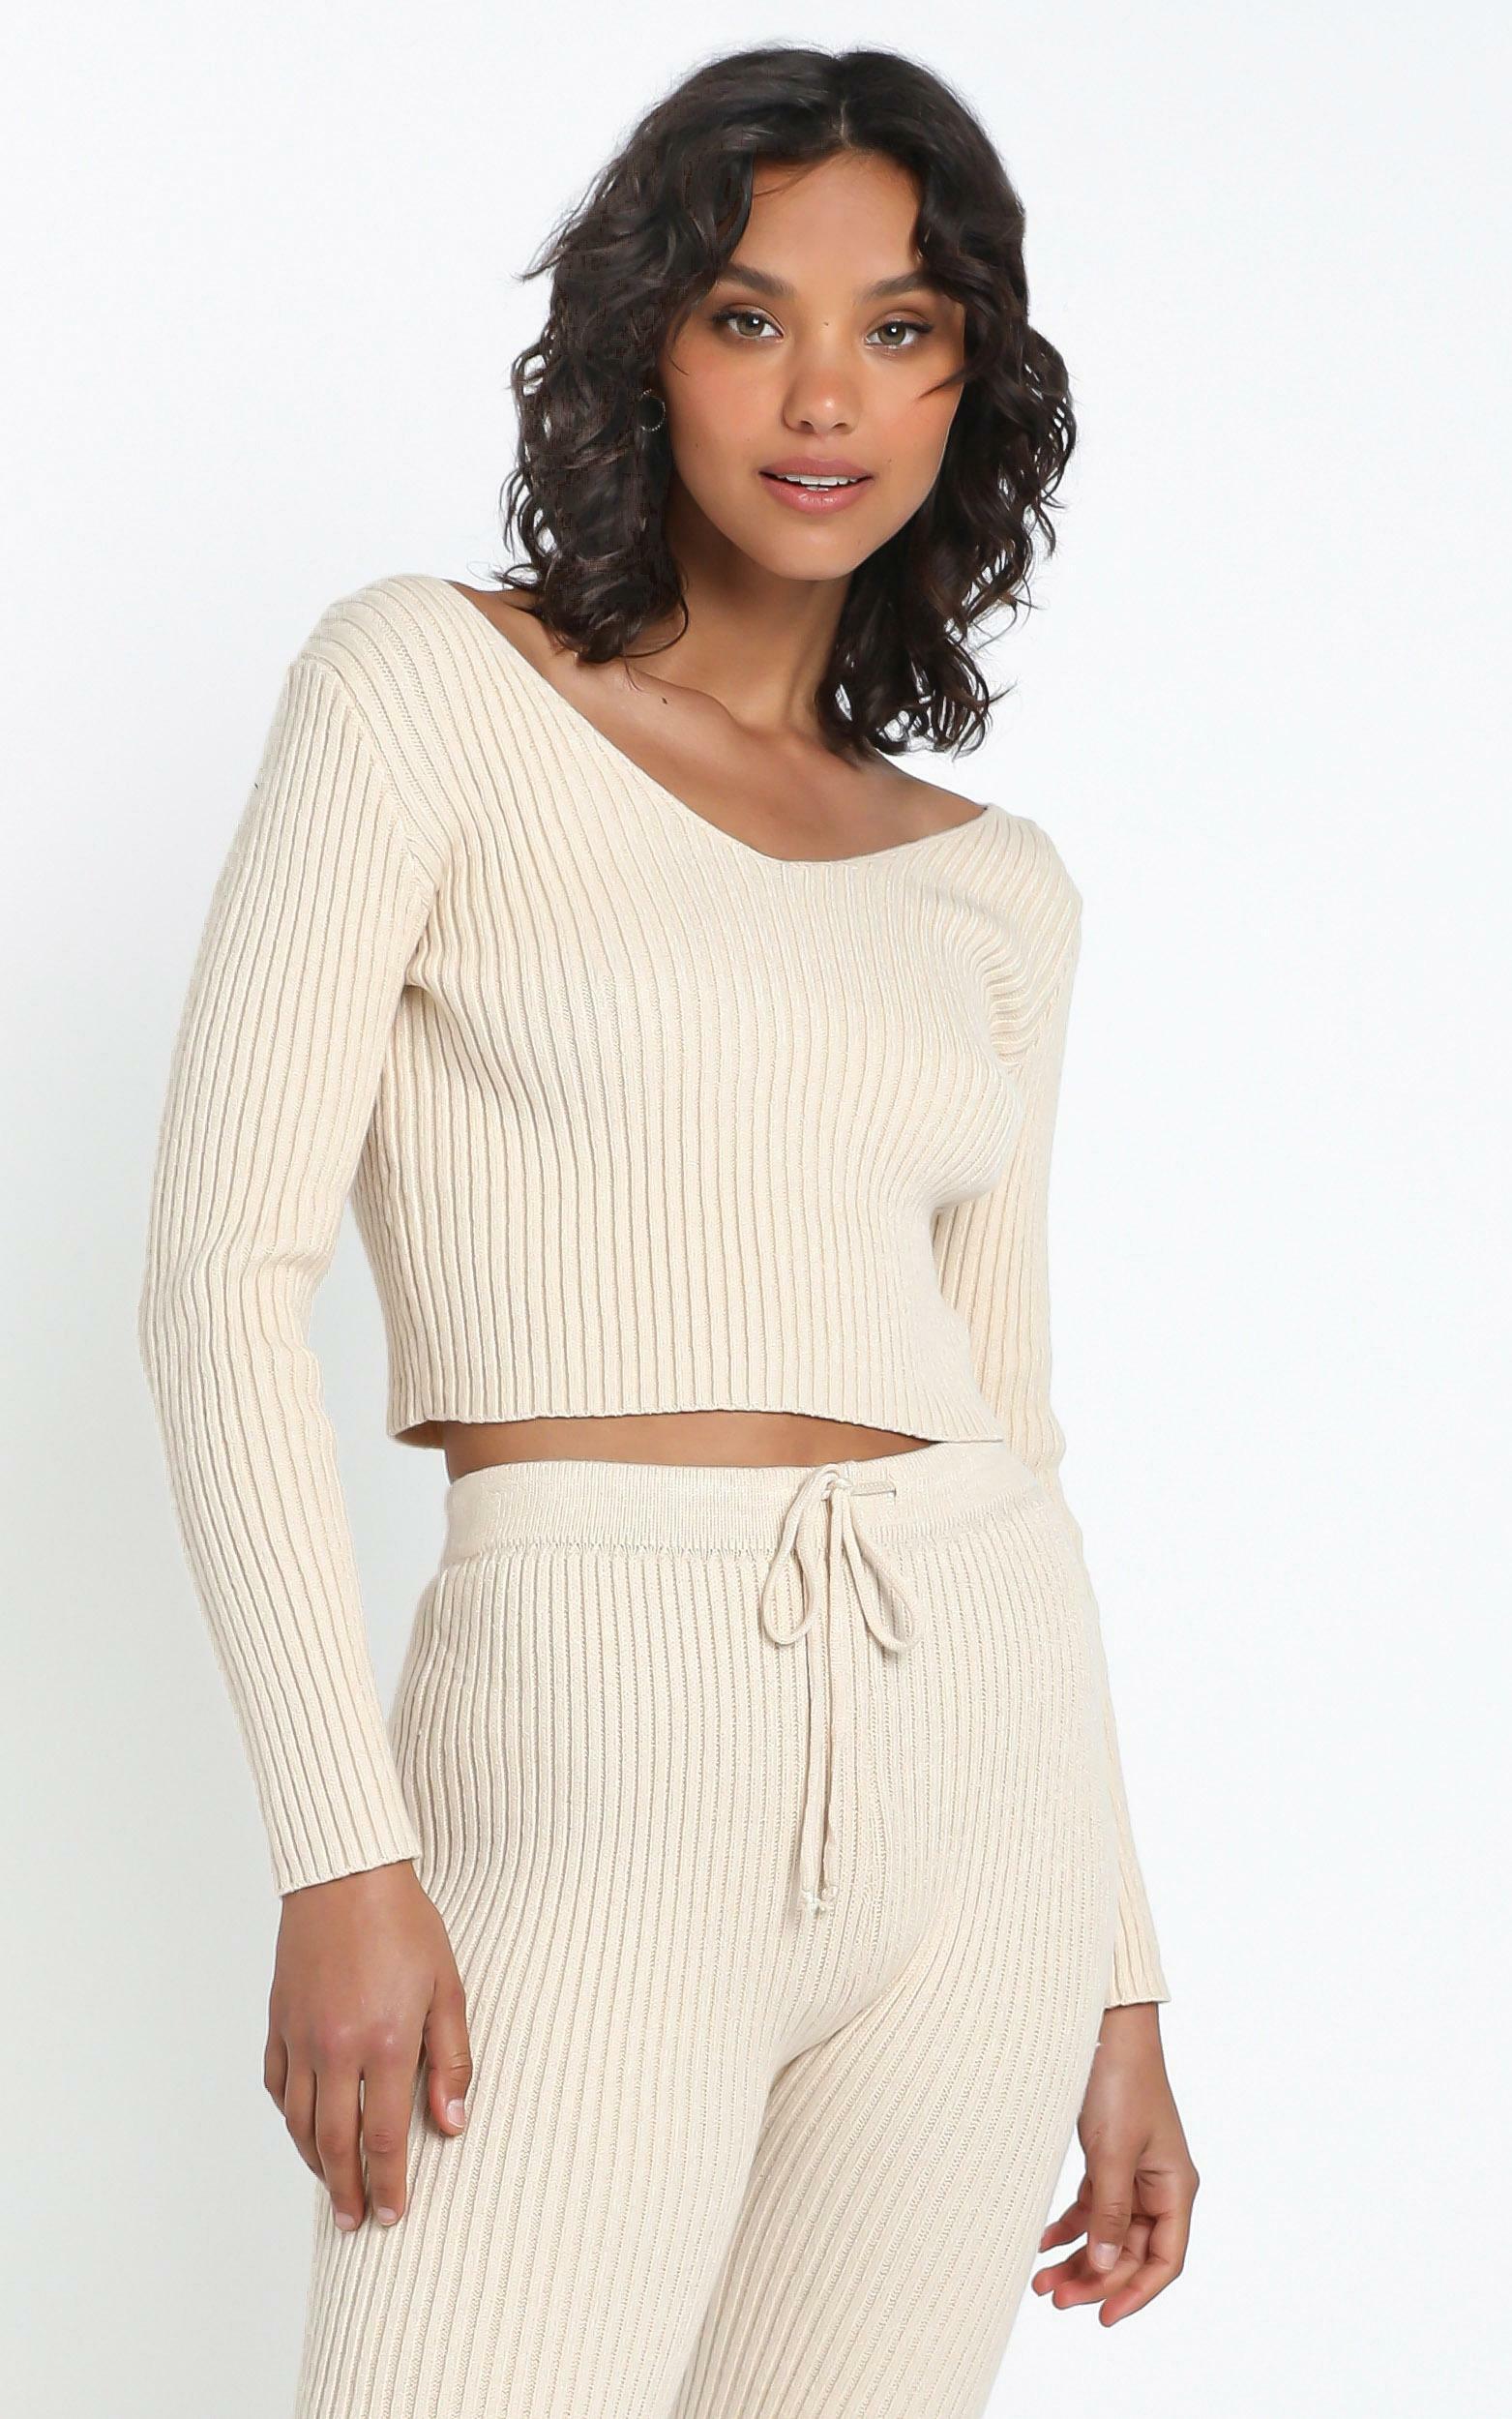 Gweneth Knit Jumper in Beige - 12 (L), Cream, hi-res image number null